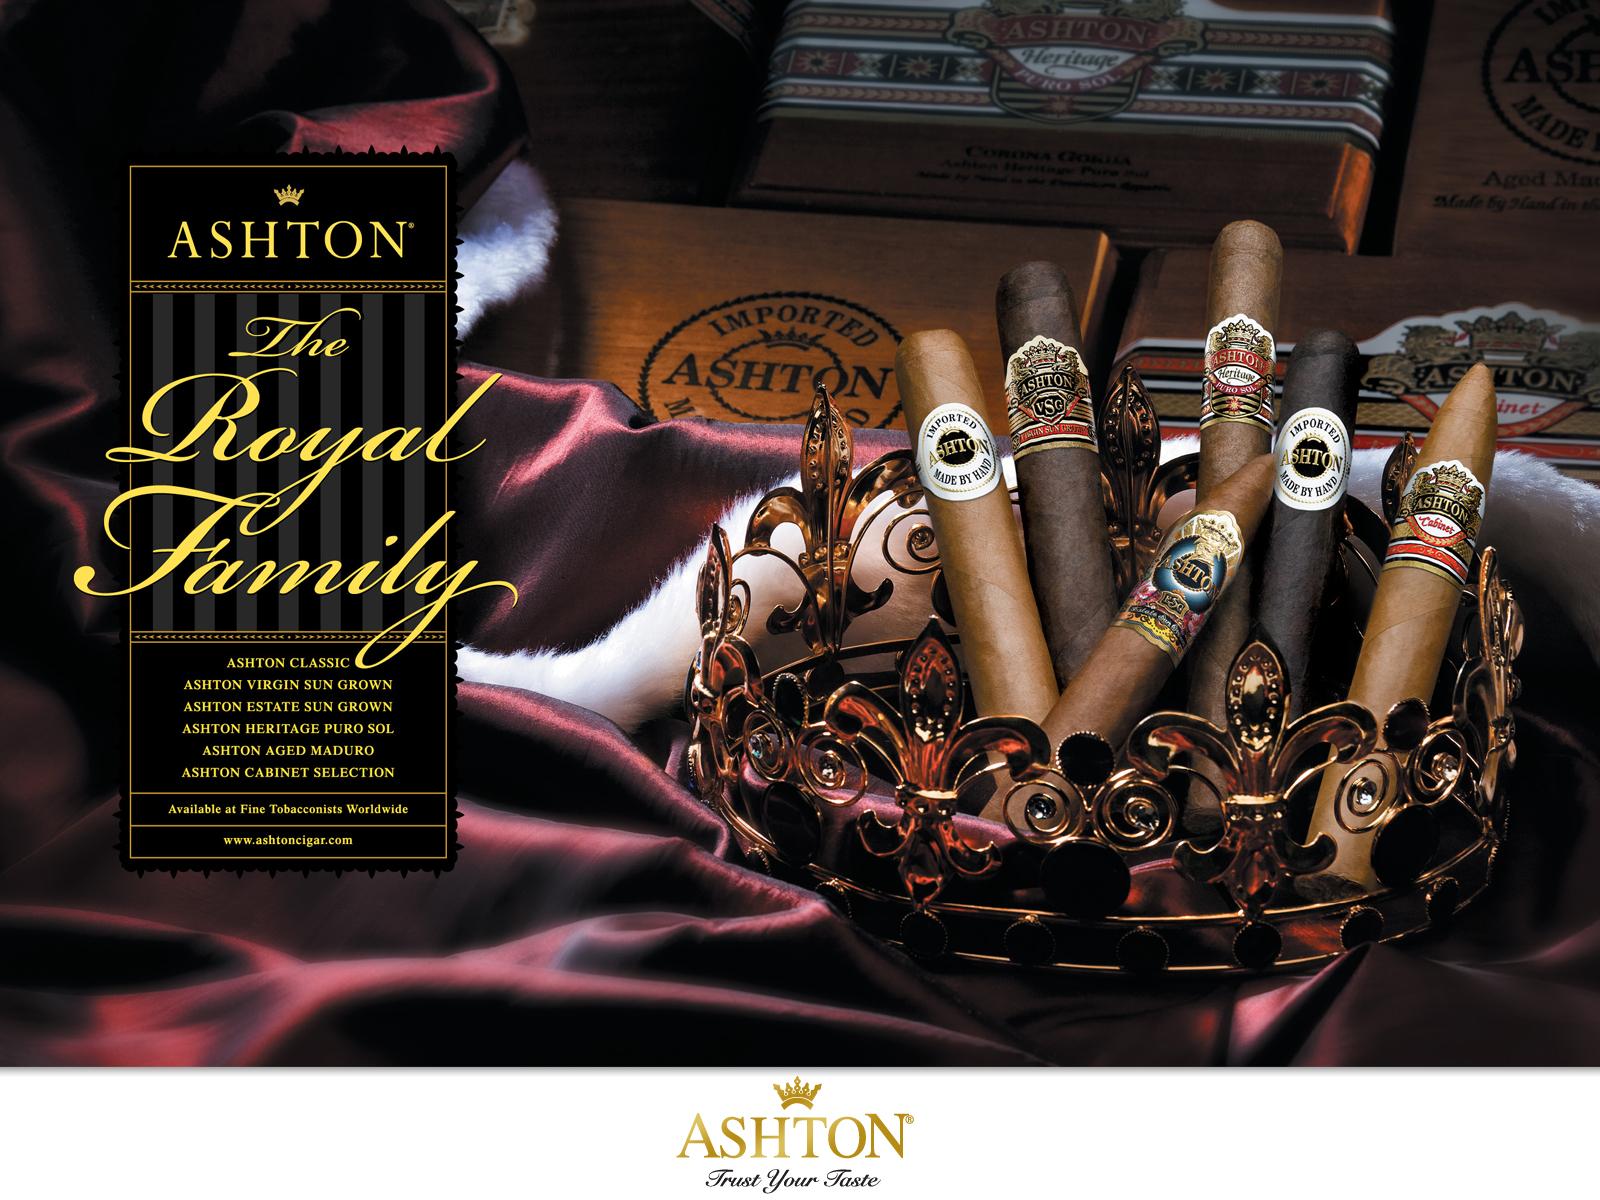 ashton_cigars_advertising_campaign_cigarmonkeys_1_1.jpg